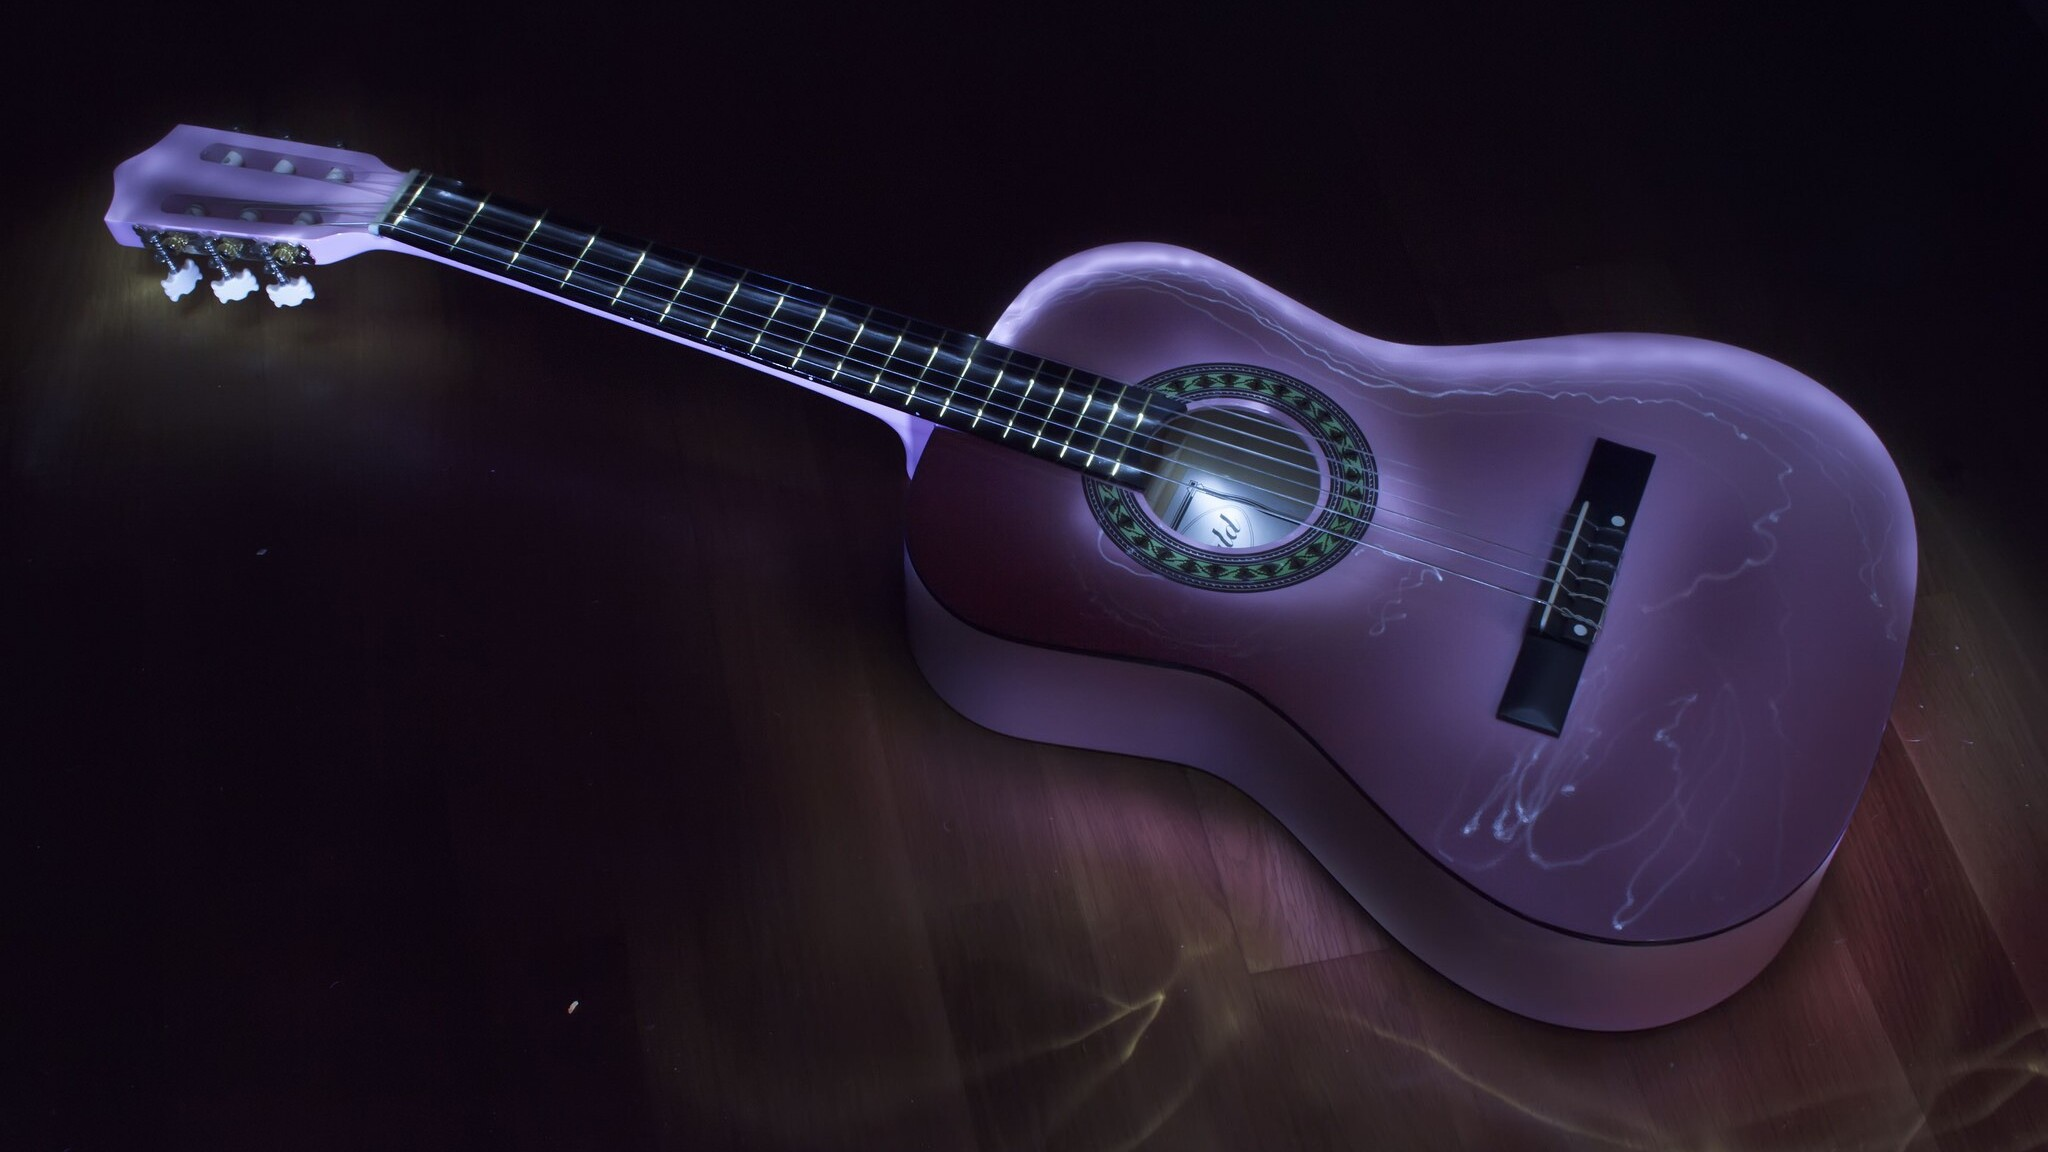 2048x1152 guitar amazing art 2048x1152 resolution hd 4k wallpapers guitar amazing artg voltagebd Gallery